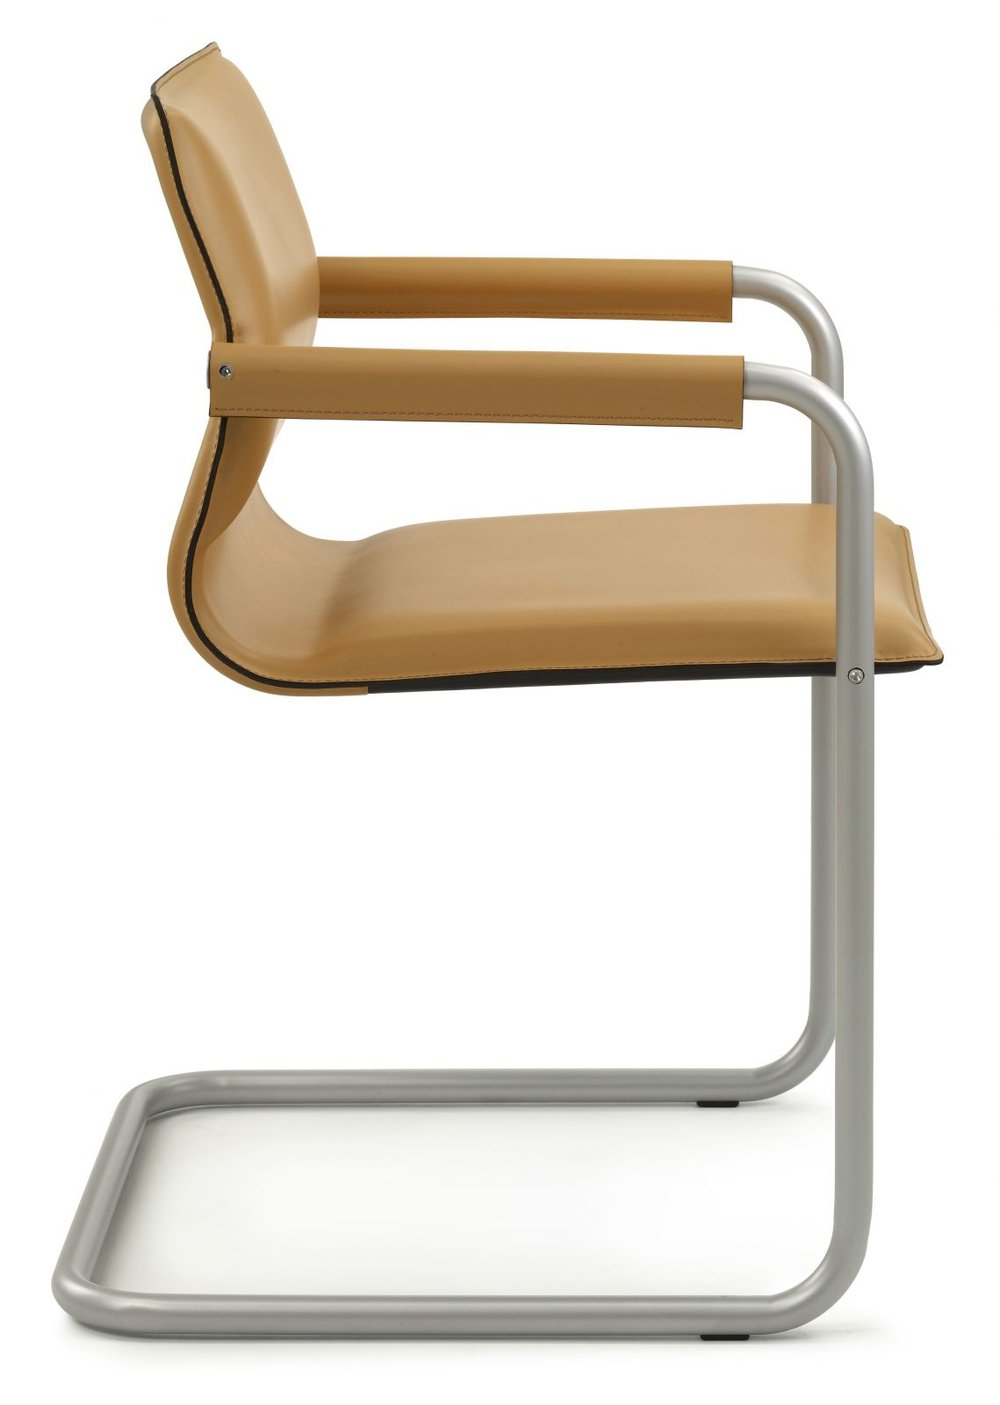 modern-office-furniture-chairs-Italian-designer-furniture (2).jpg